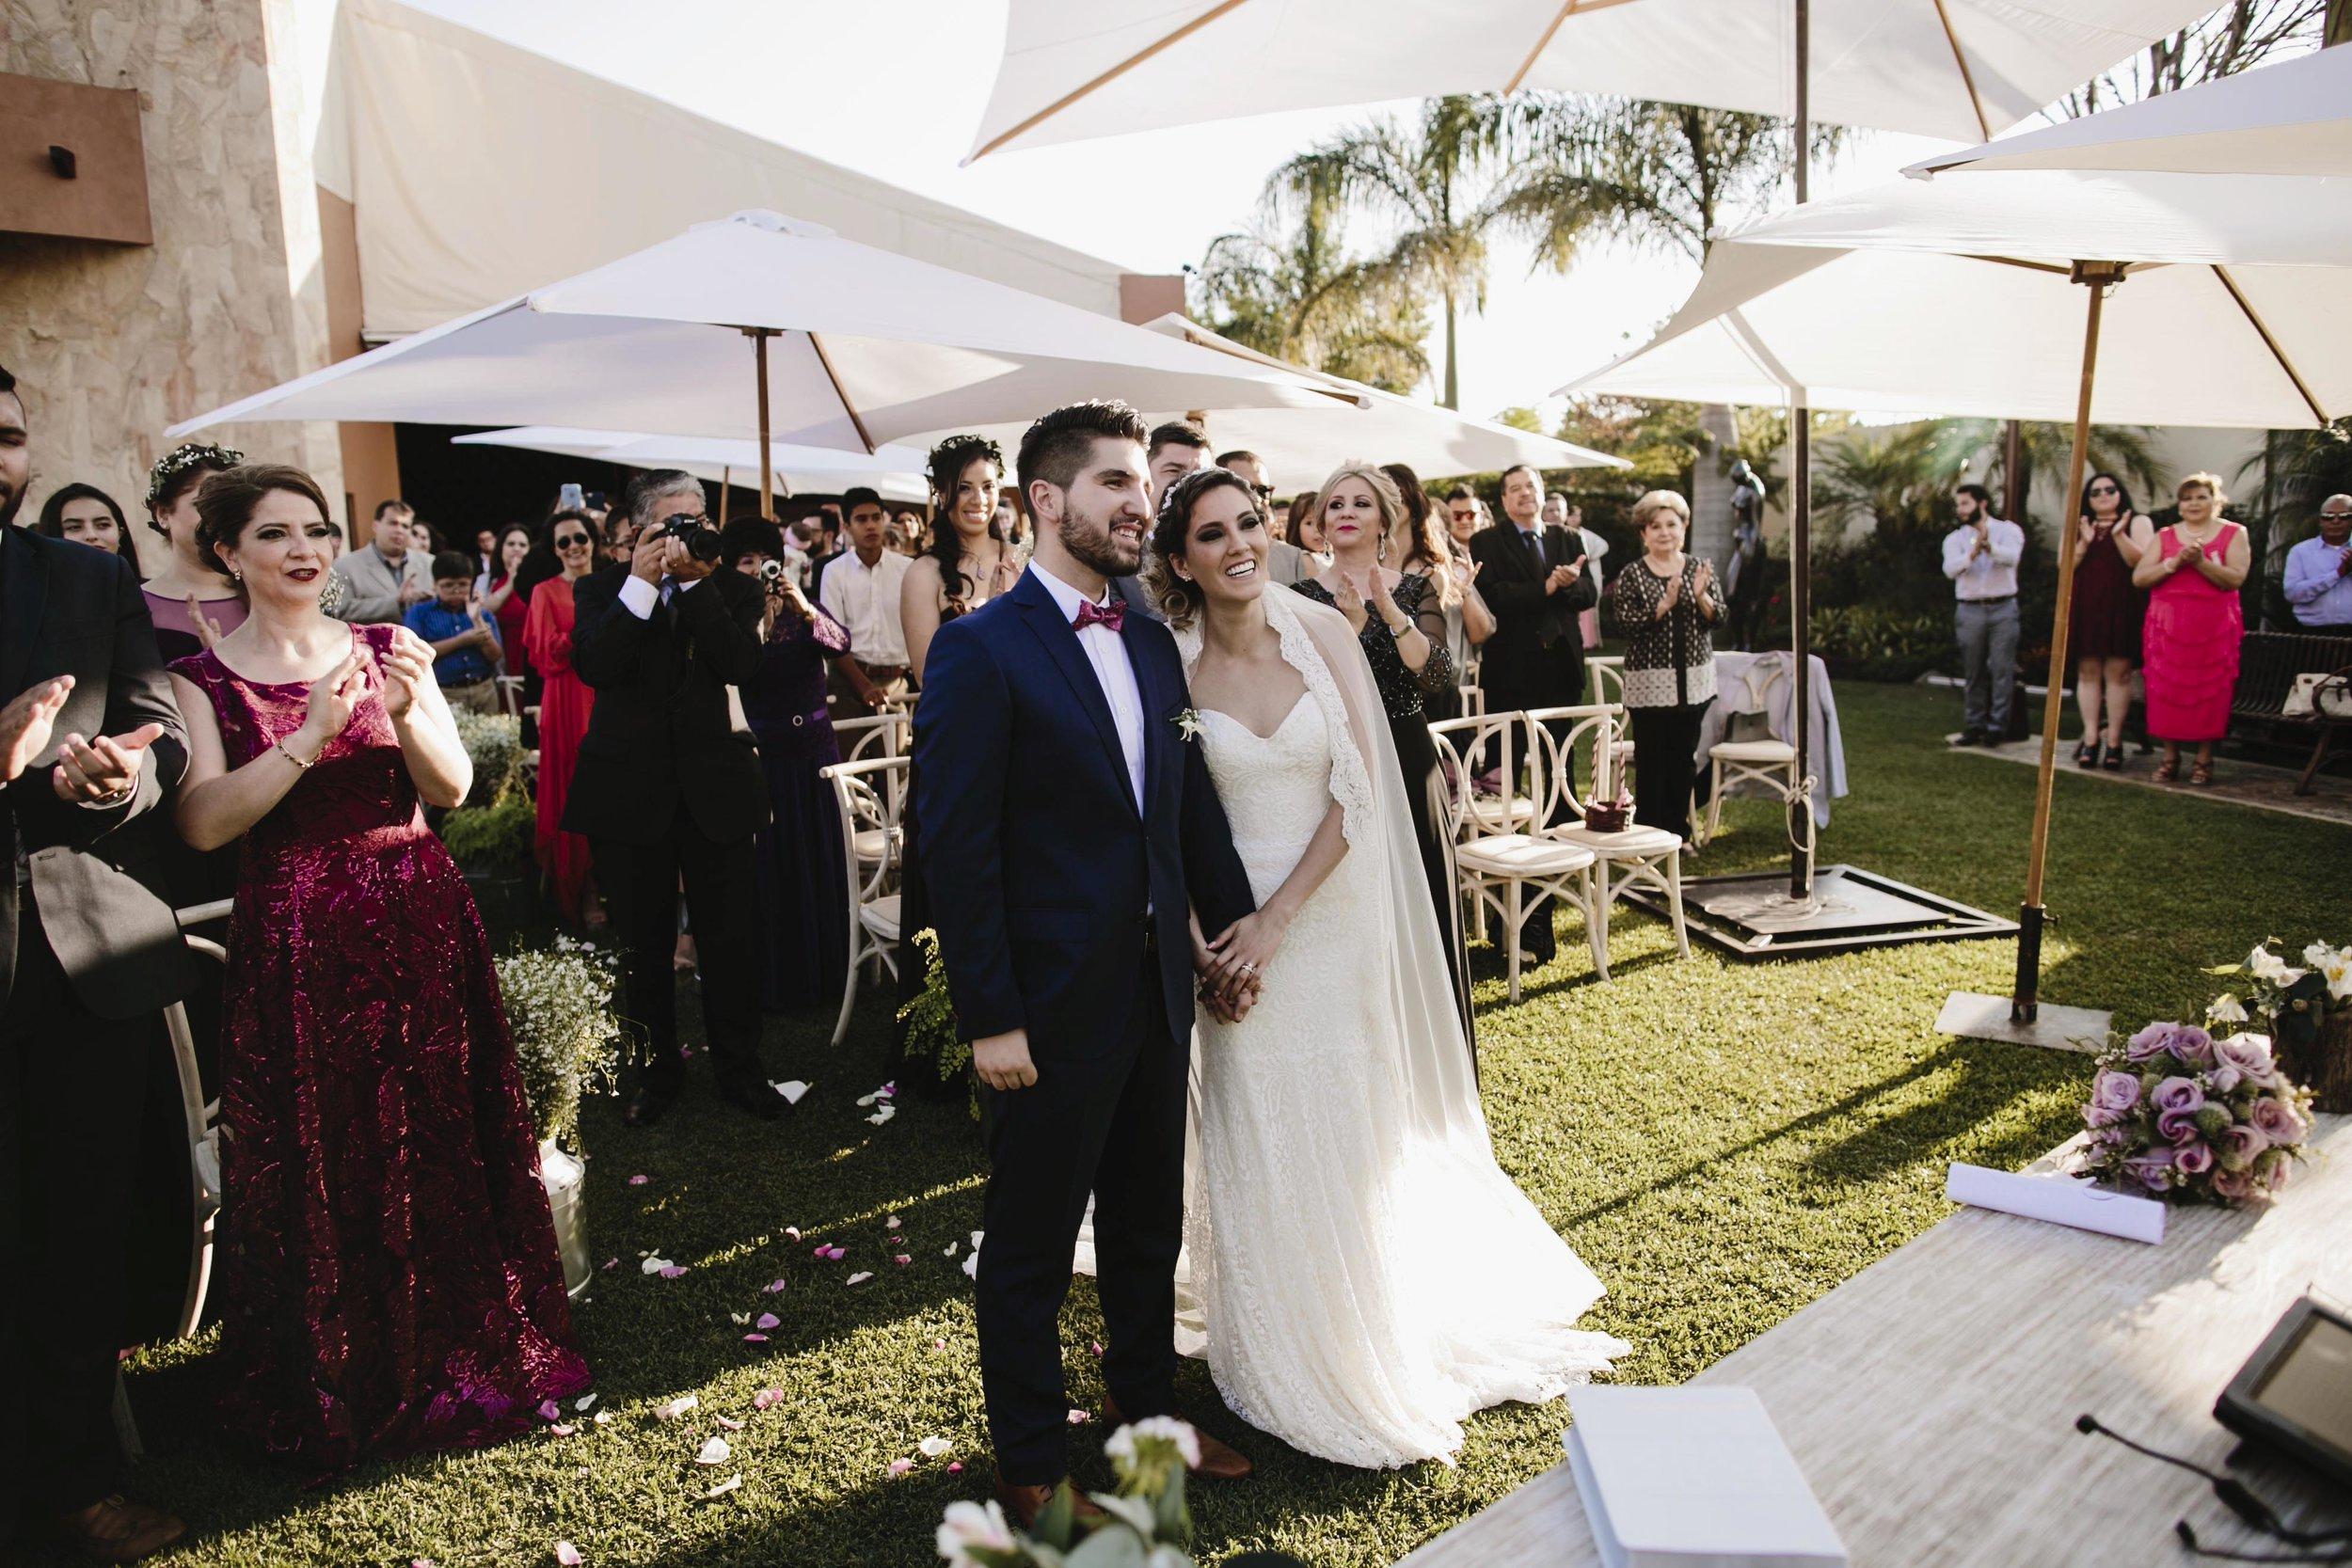 alfonso_flores_destination_wedding_photography_jardin_amarello_cuernavaca56.jpg